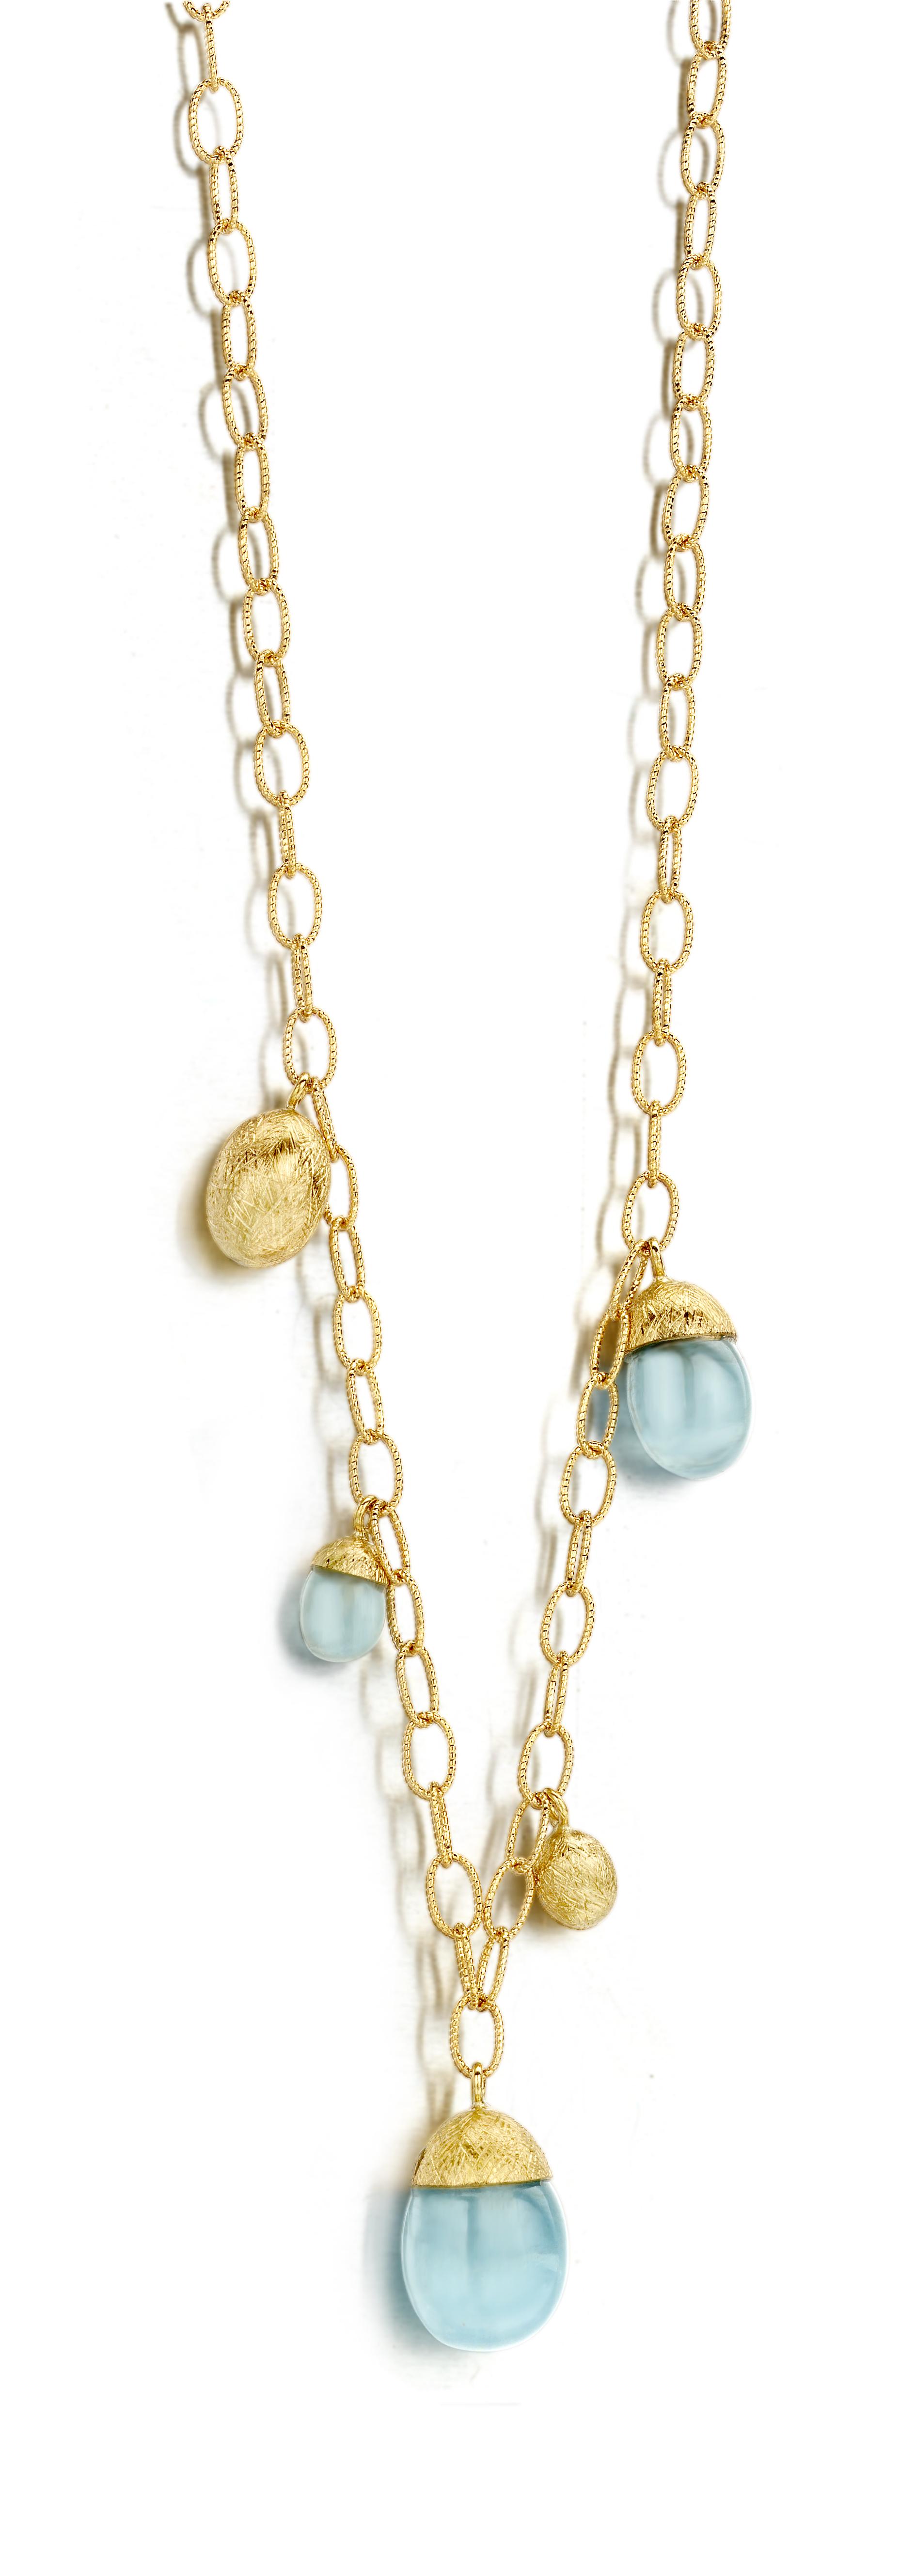 Nanis Necklace | Camarillo Jewelers | Van Gundys